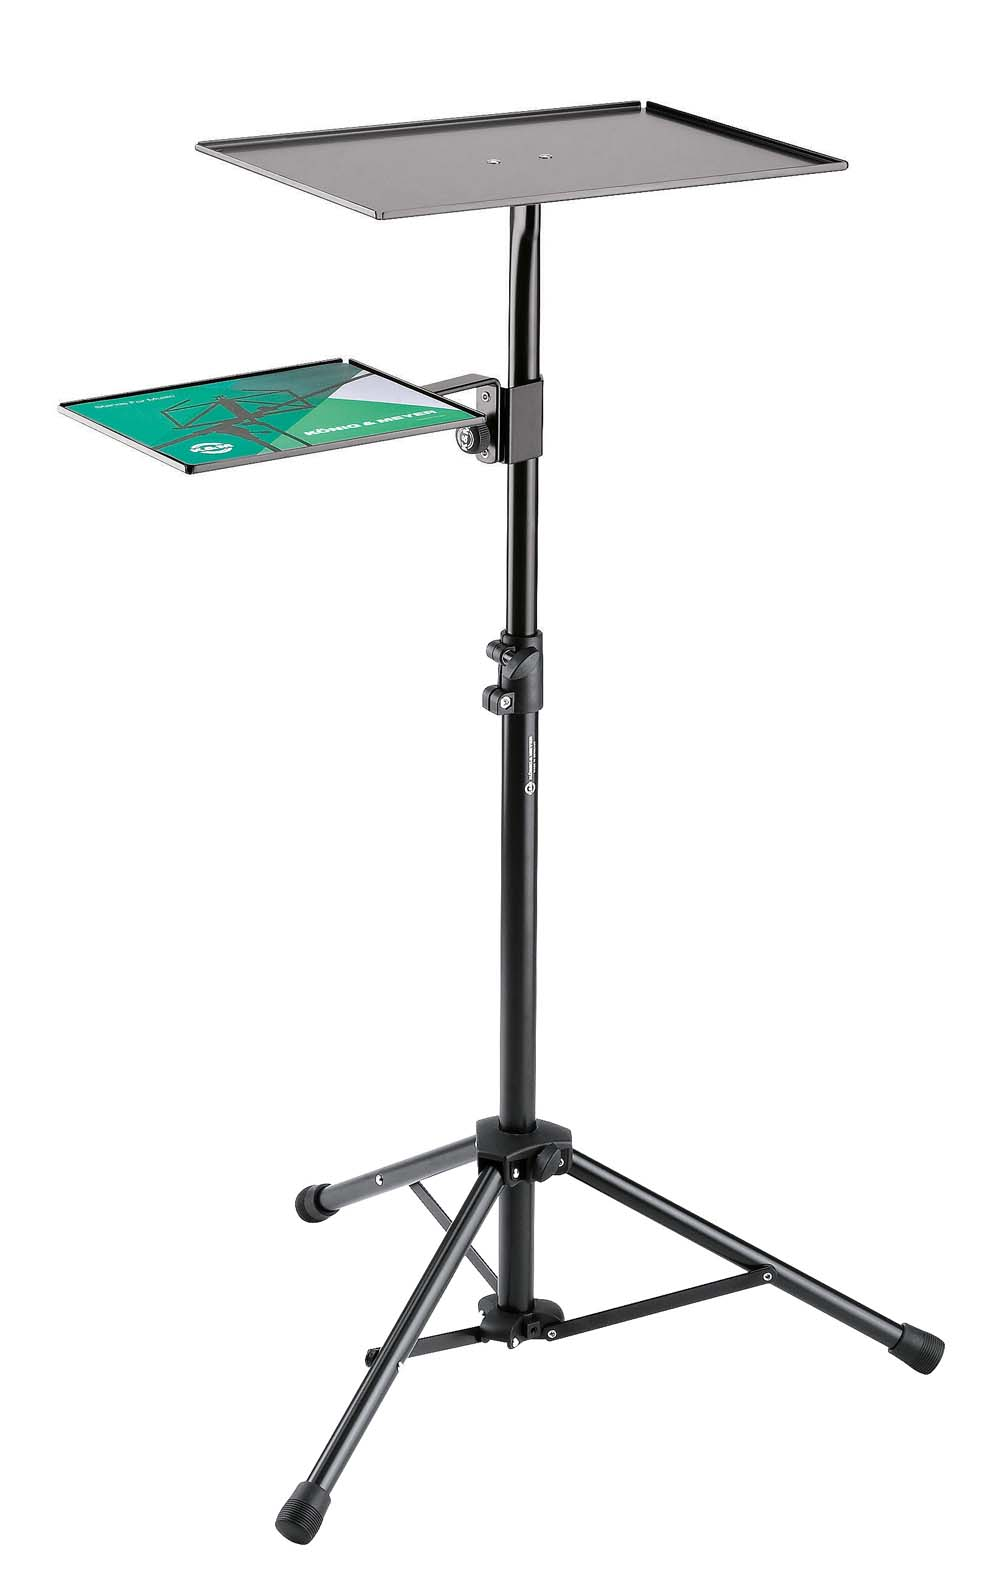 KM 12150 Laptop stand